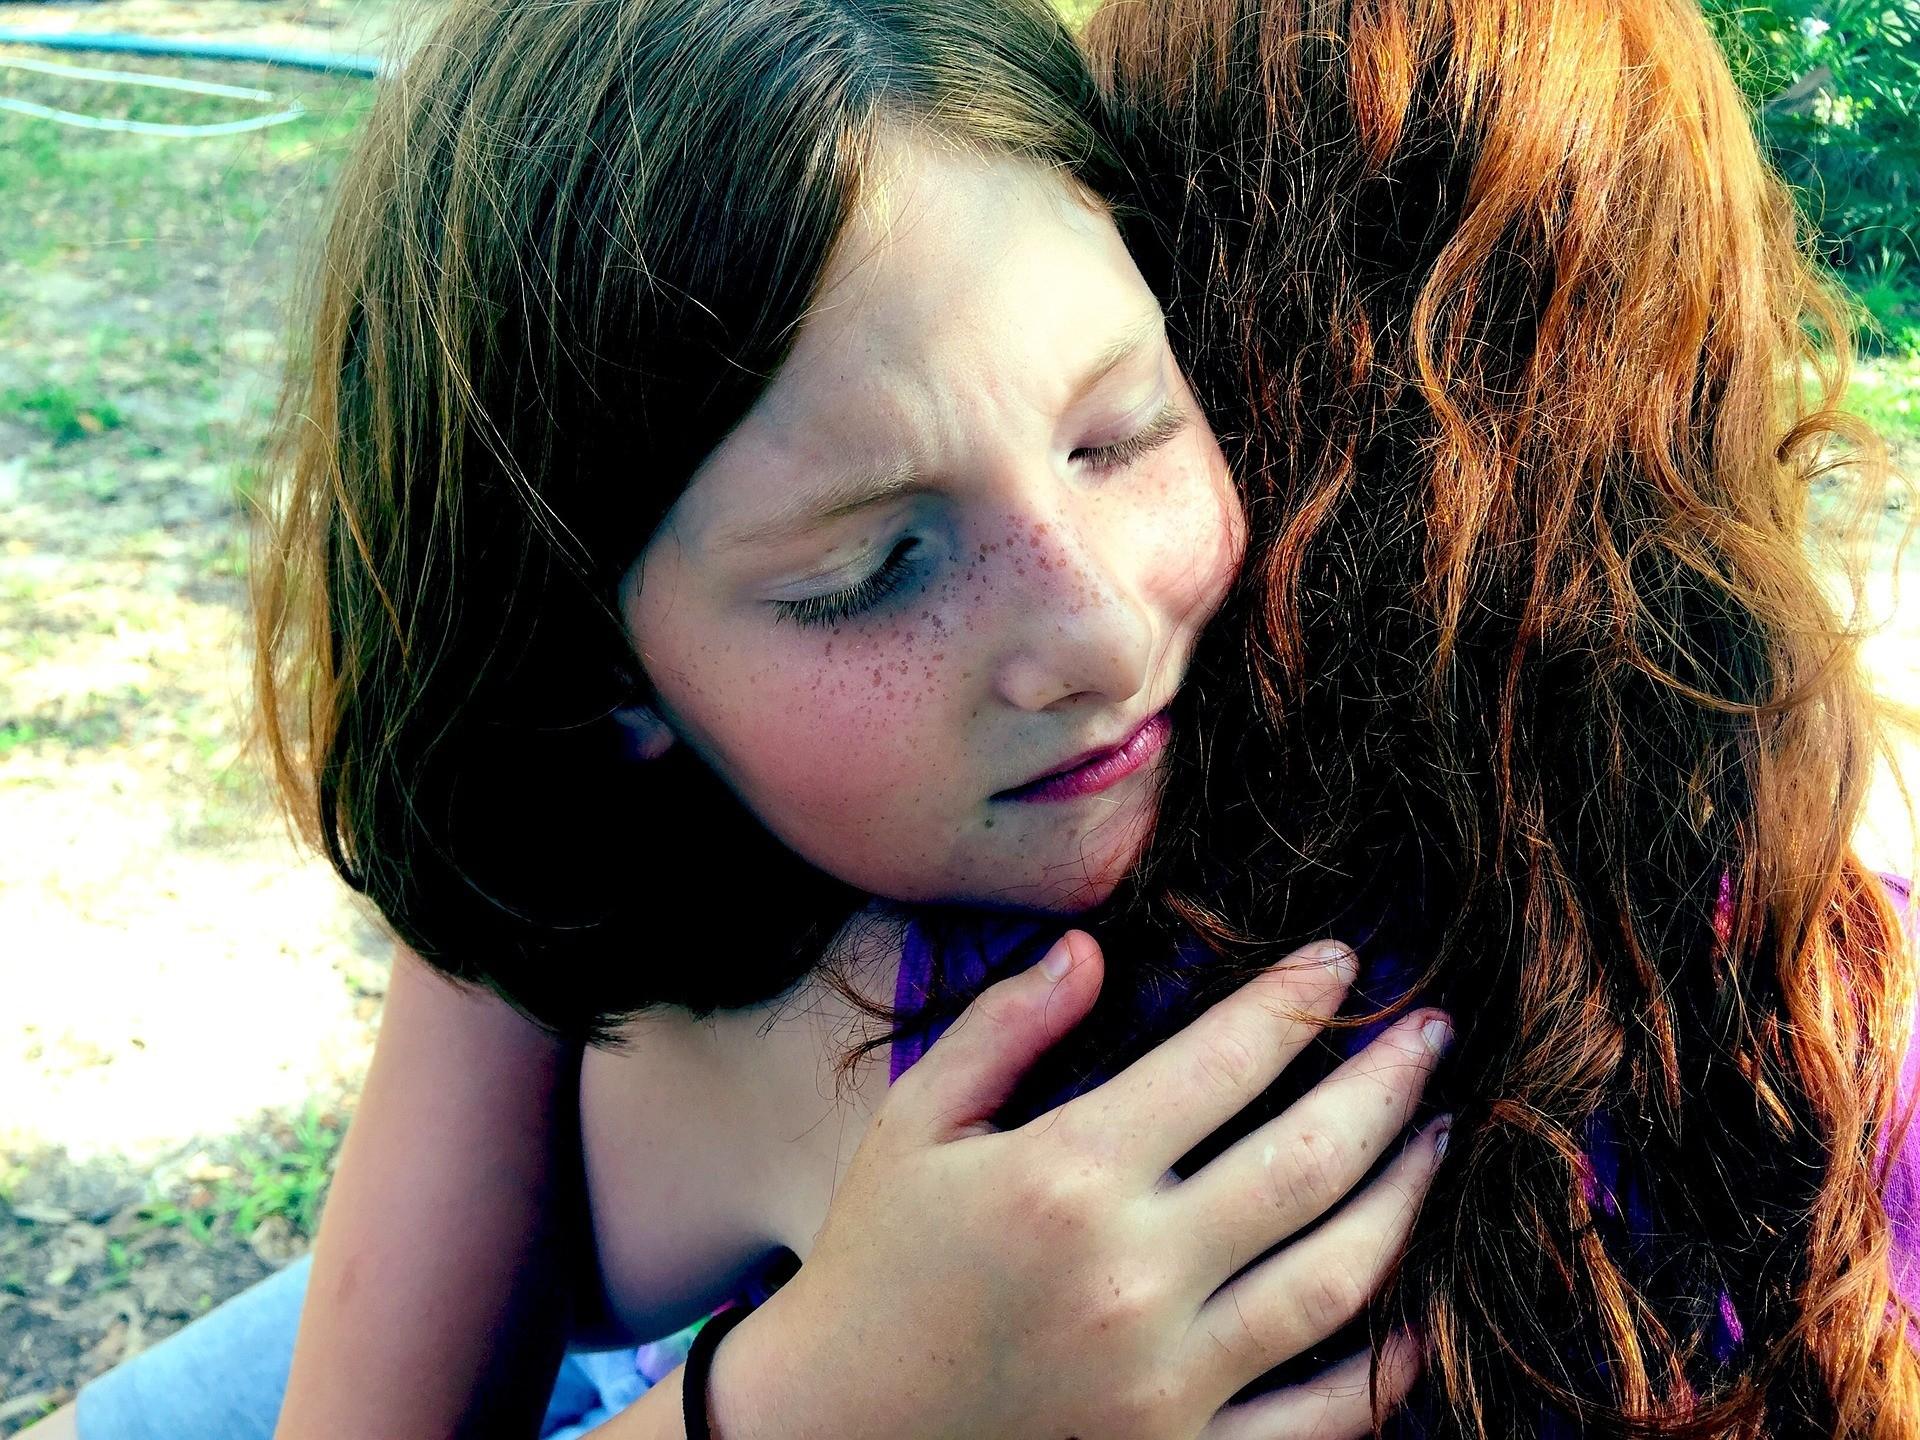 hug-1315552_1920